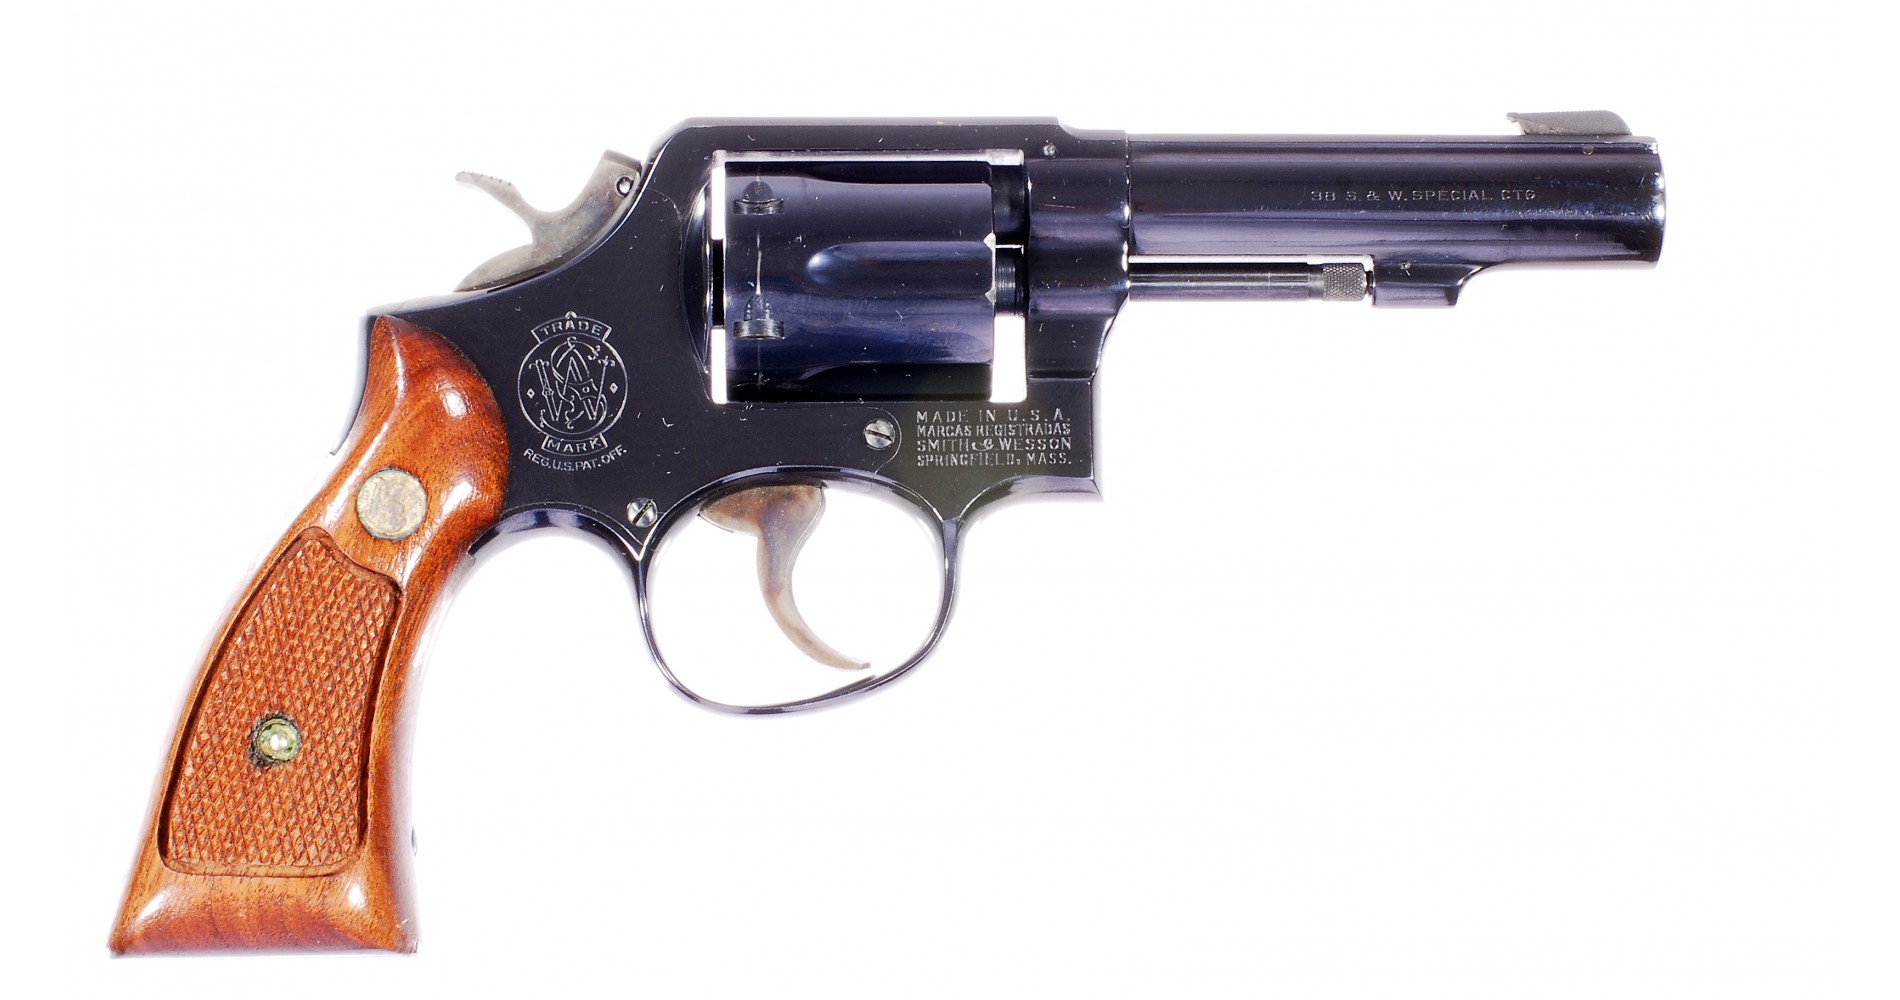 Revolver smith amp wesson model 10 6 38 special 2232 prodej